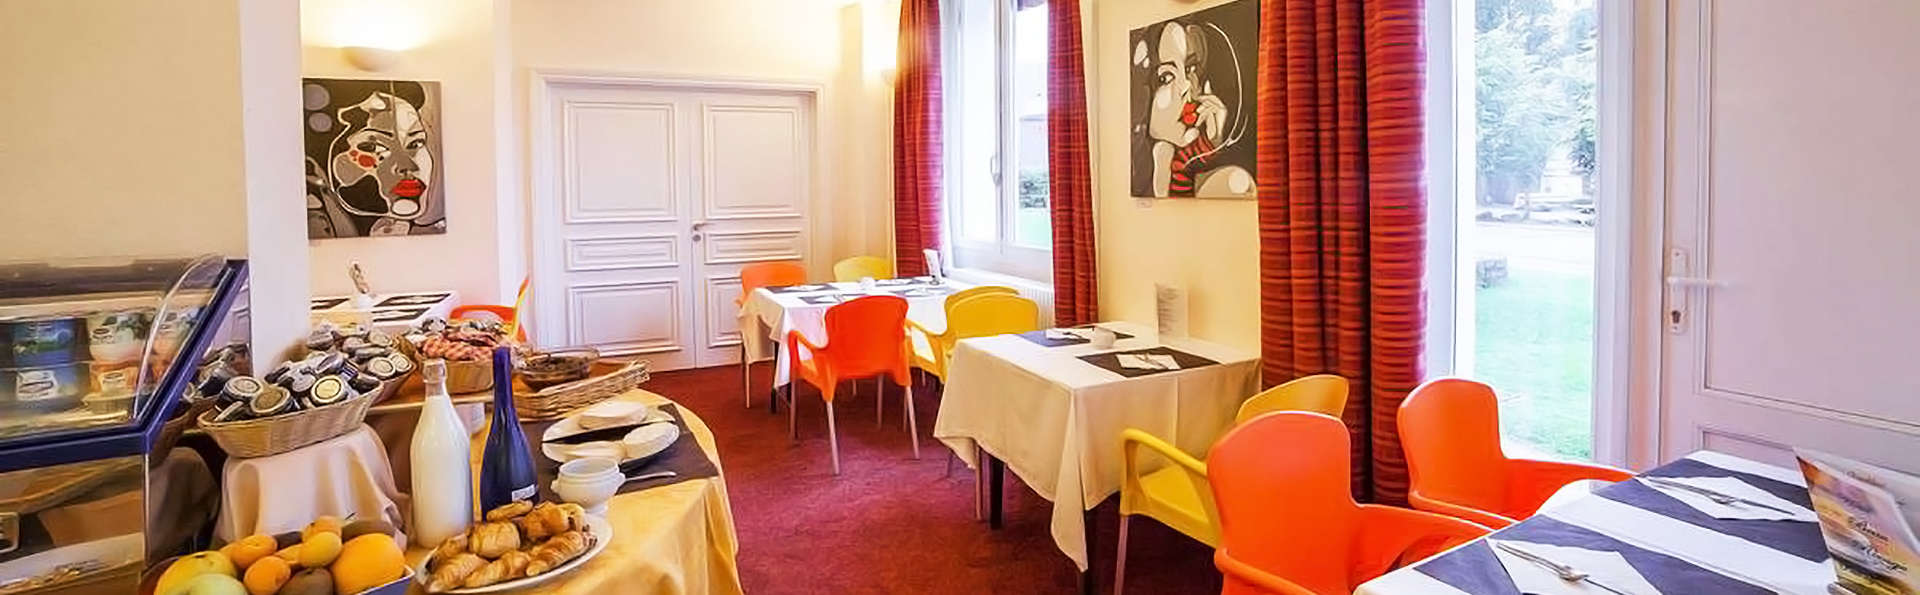 Hôtel Beau Rivage - edit_breakfast.jpg